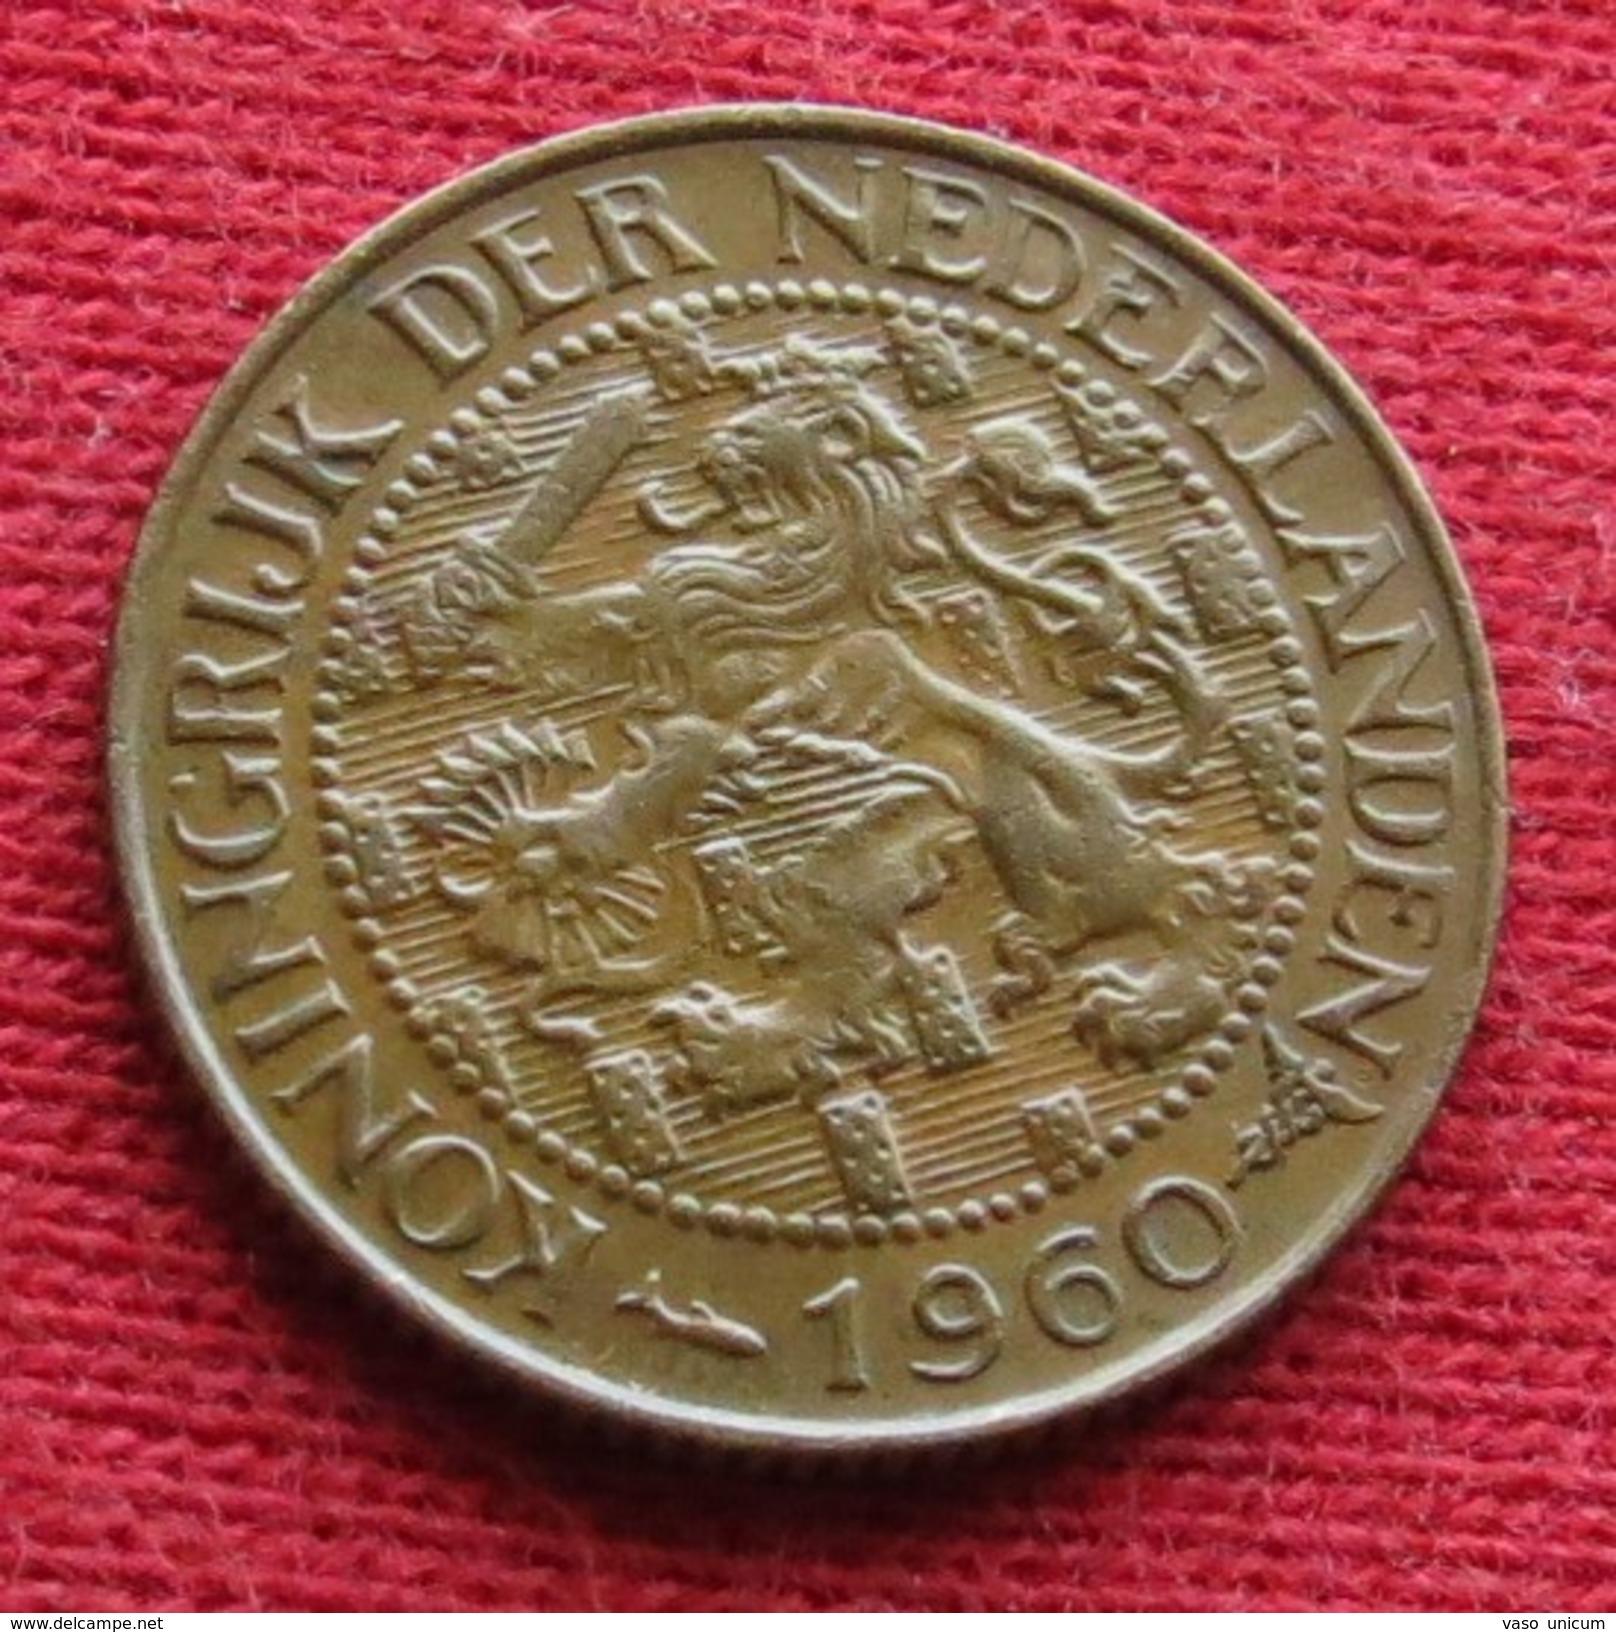 Suriname 1 Cent 1960 Km# 10a Surinam #2 - Surinam 1975 - ...